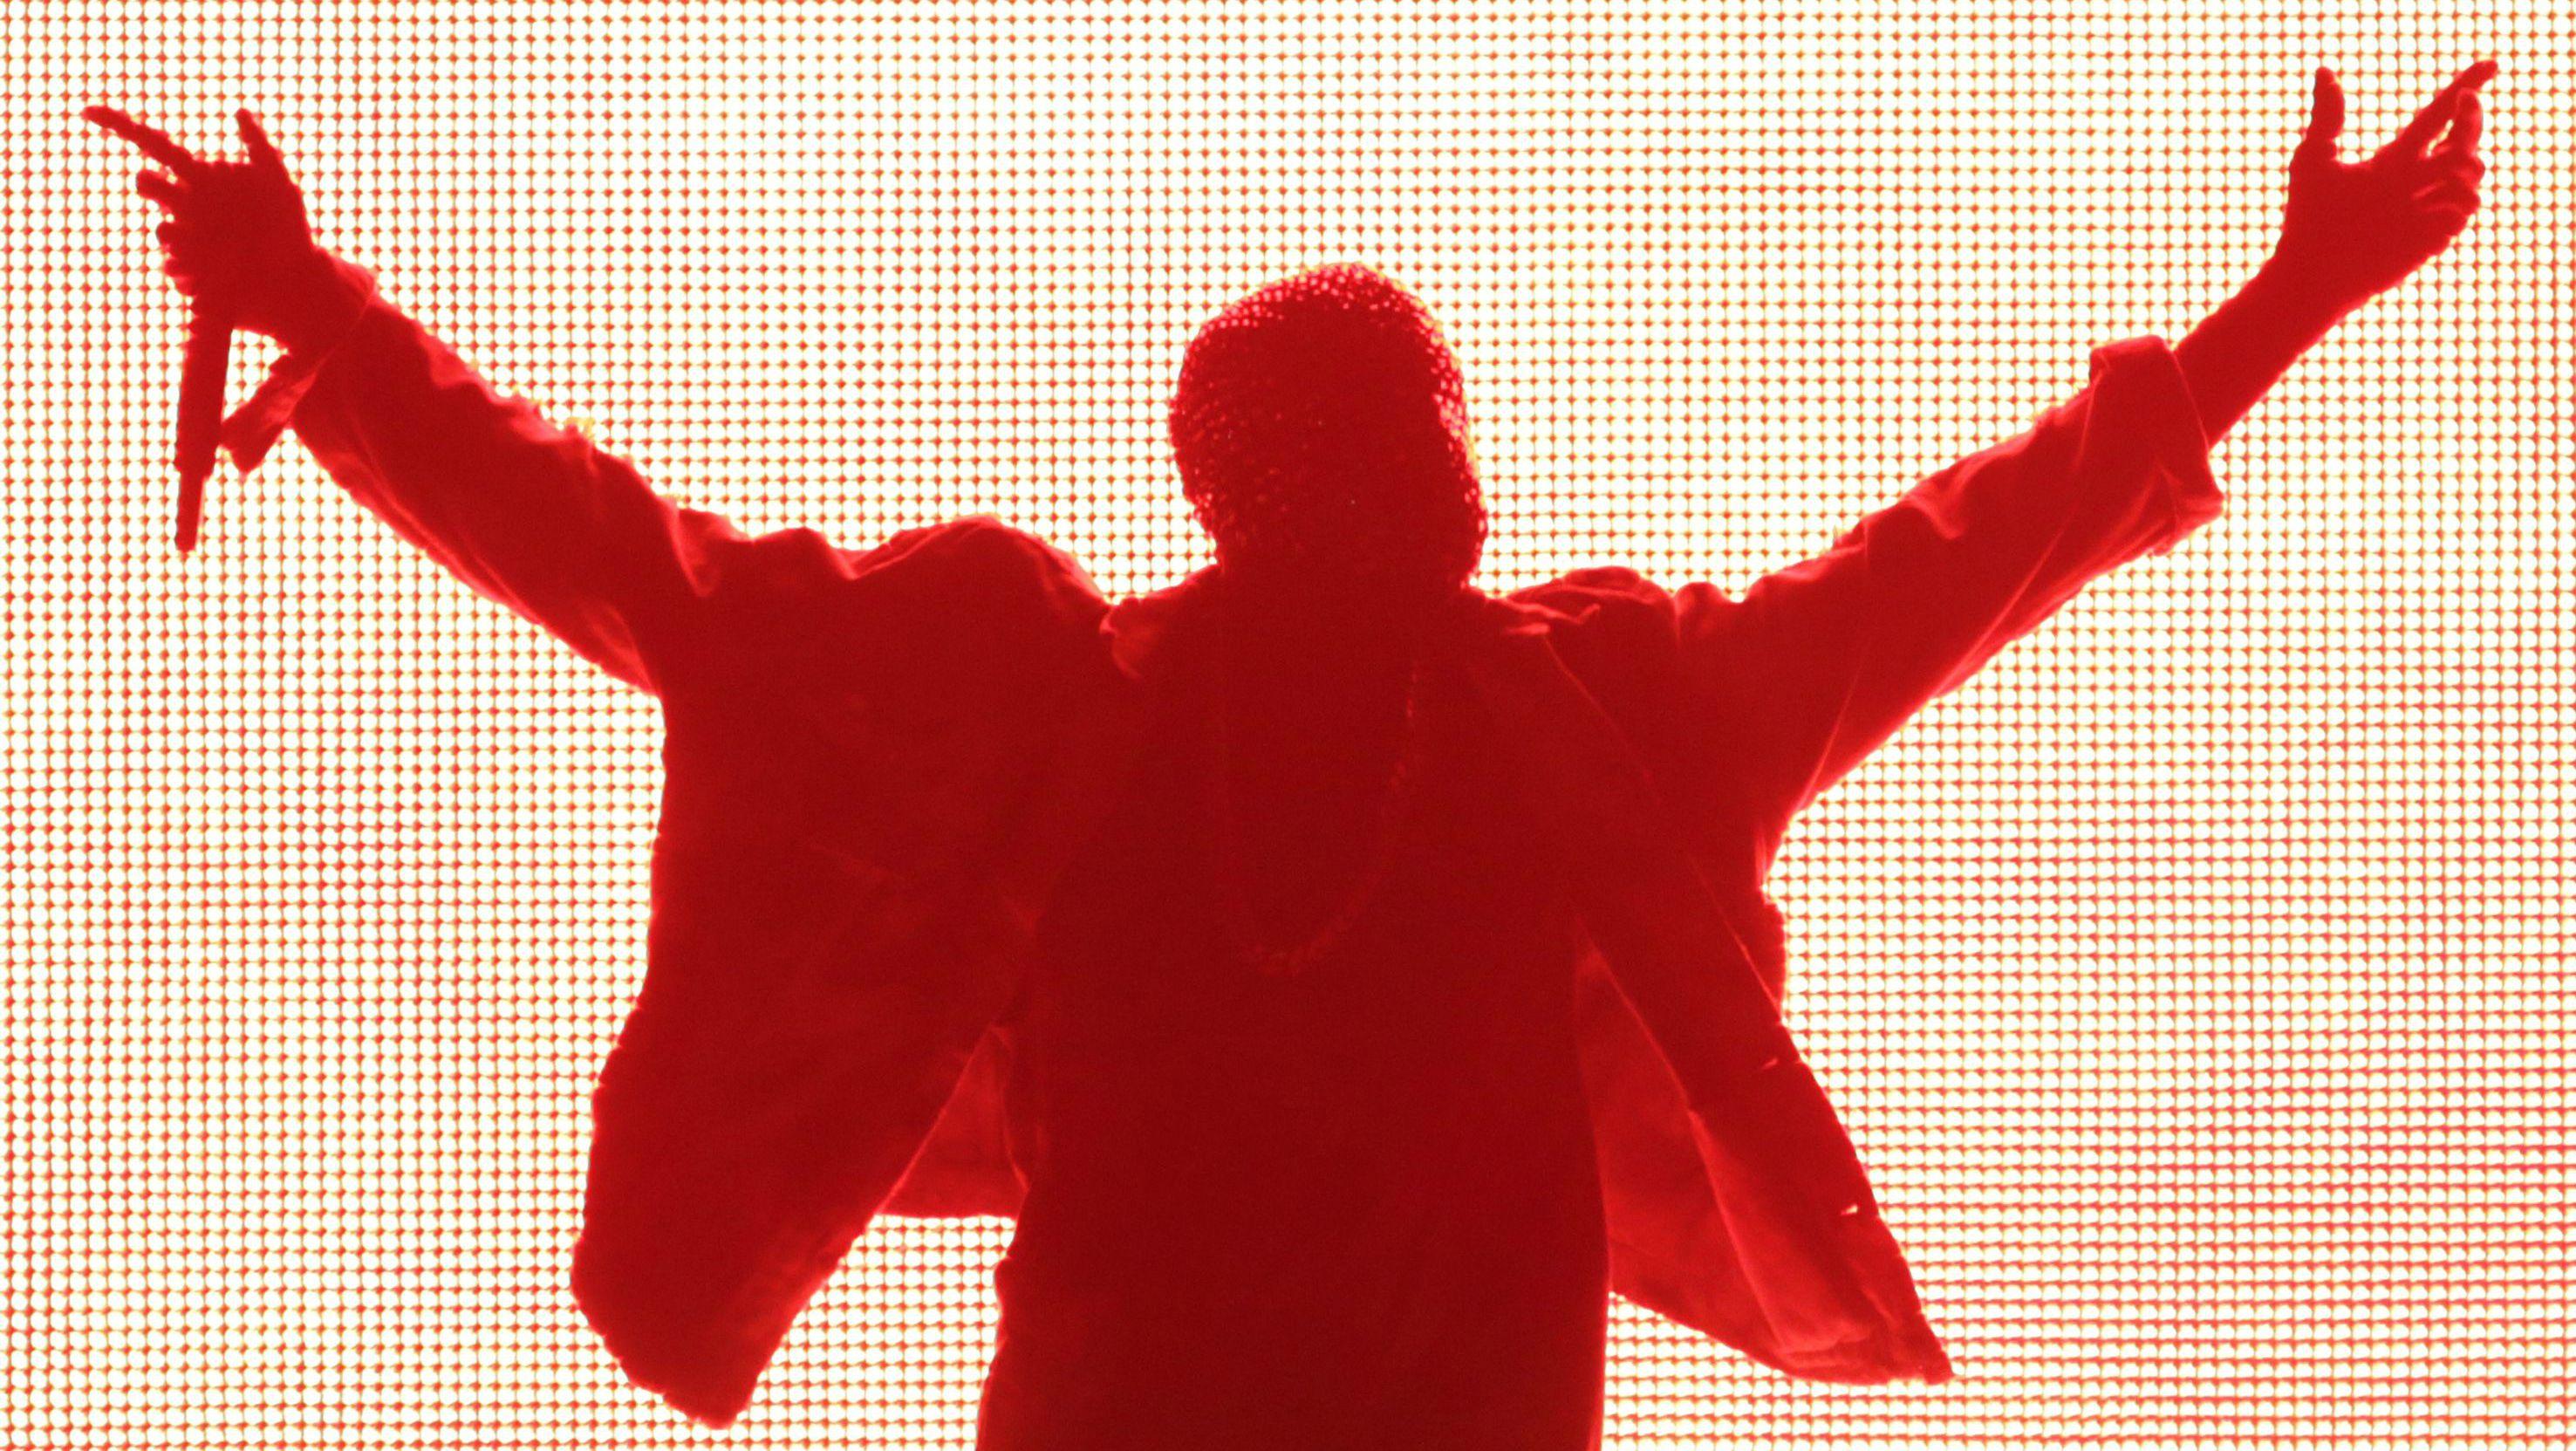 Kanye West, Adidas, Air Yeezy, sneaker collaboration, Confirmed, app, sneakers